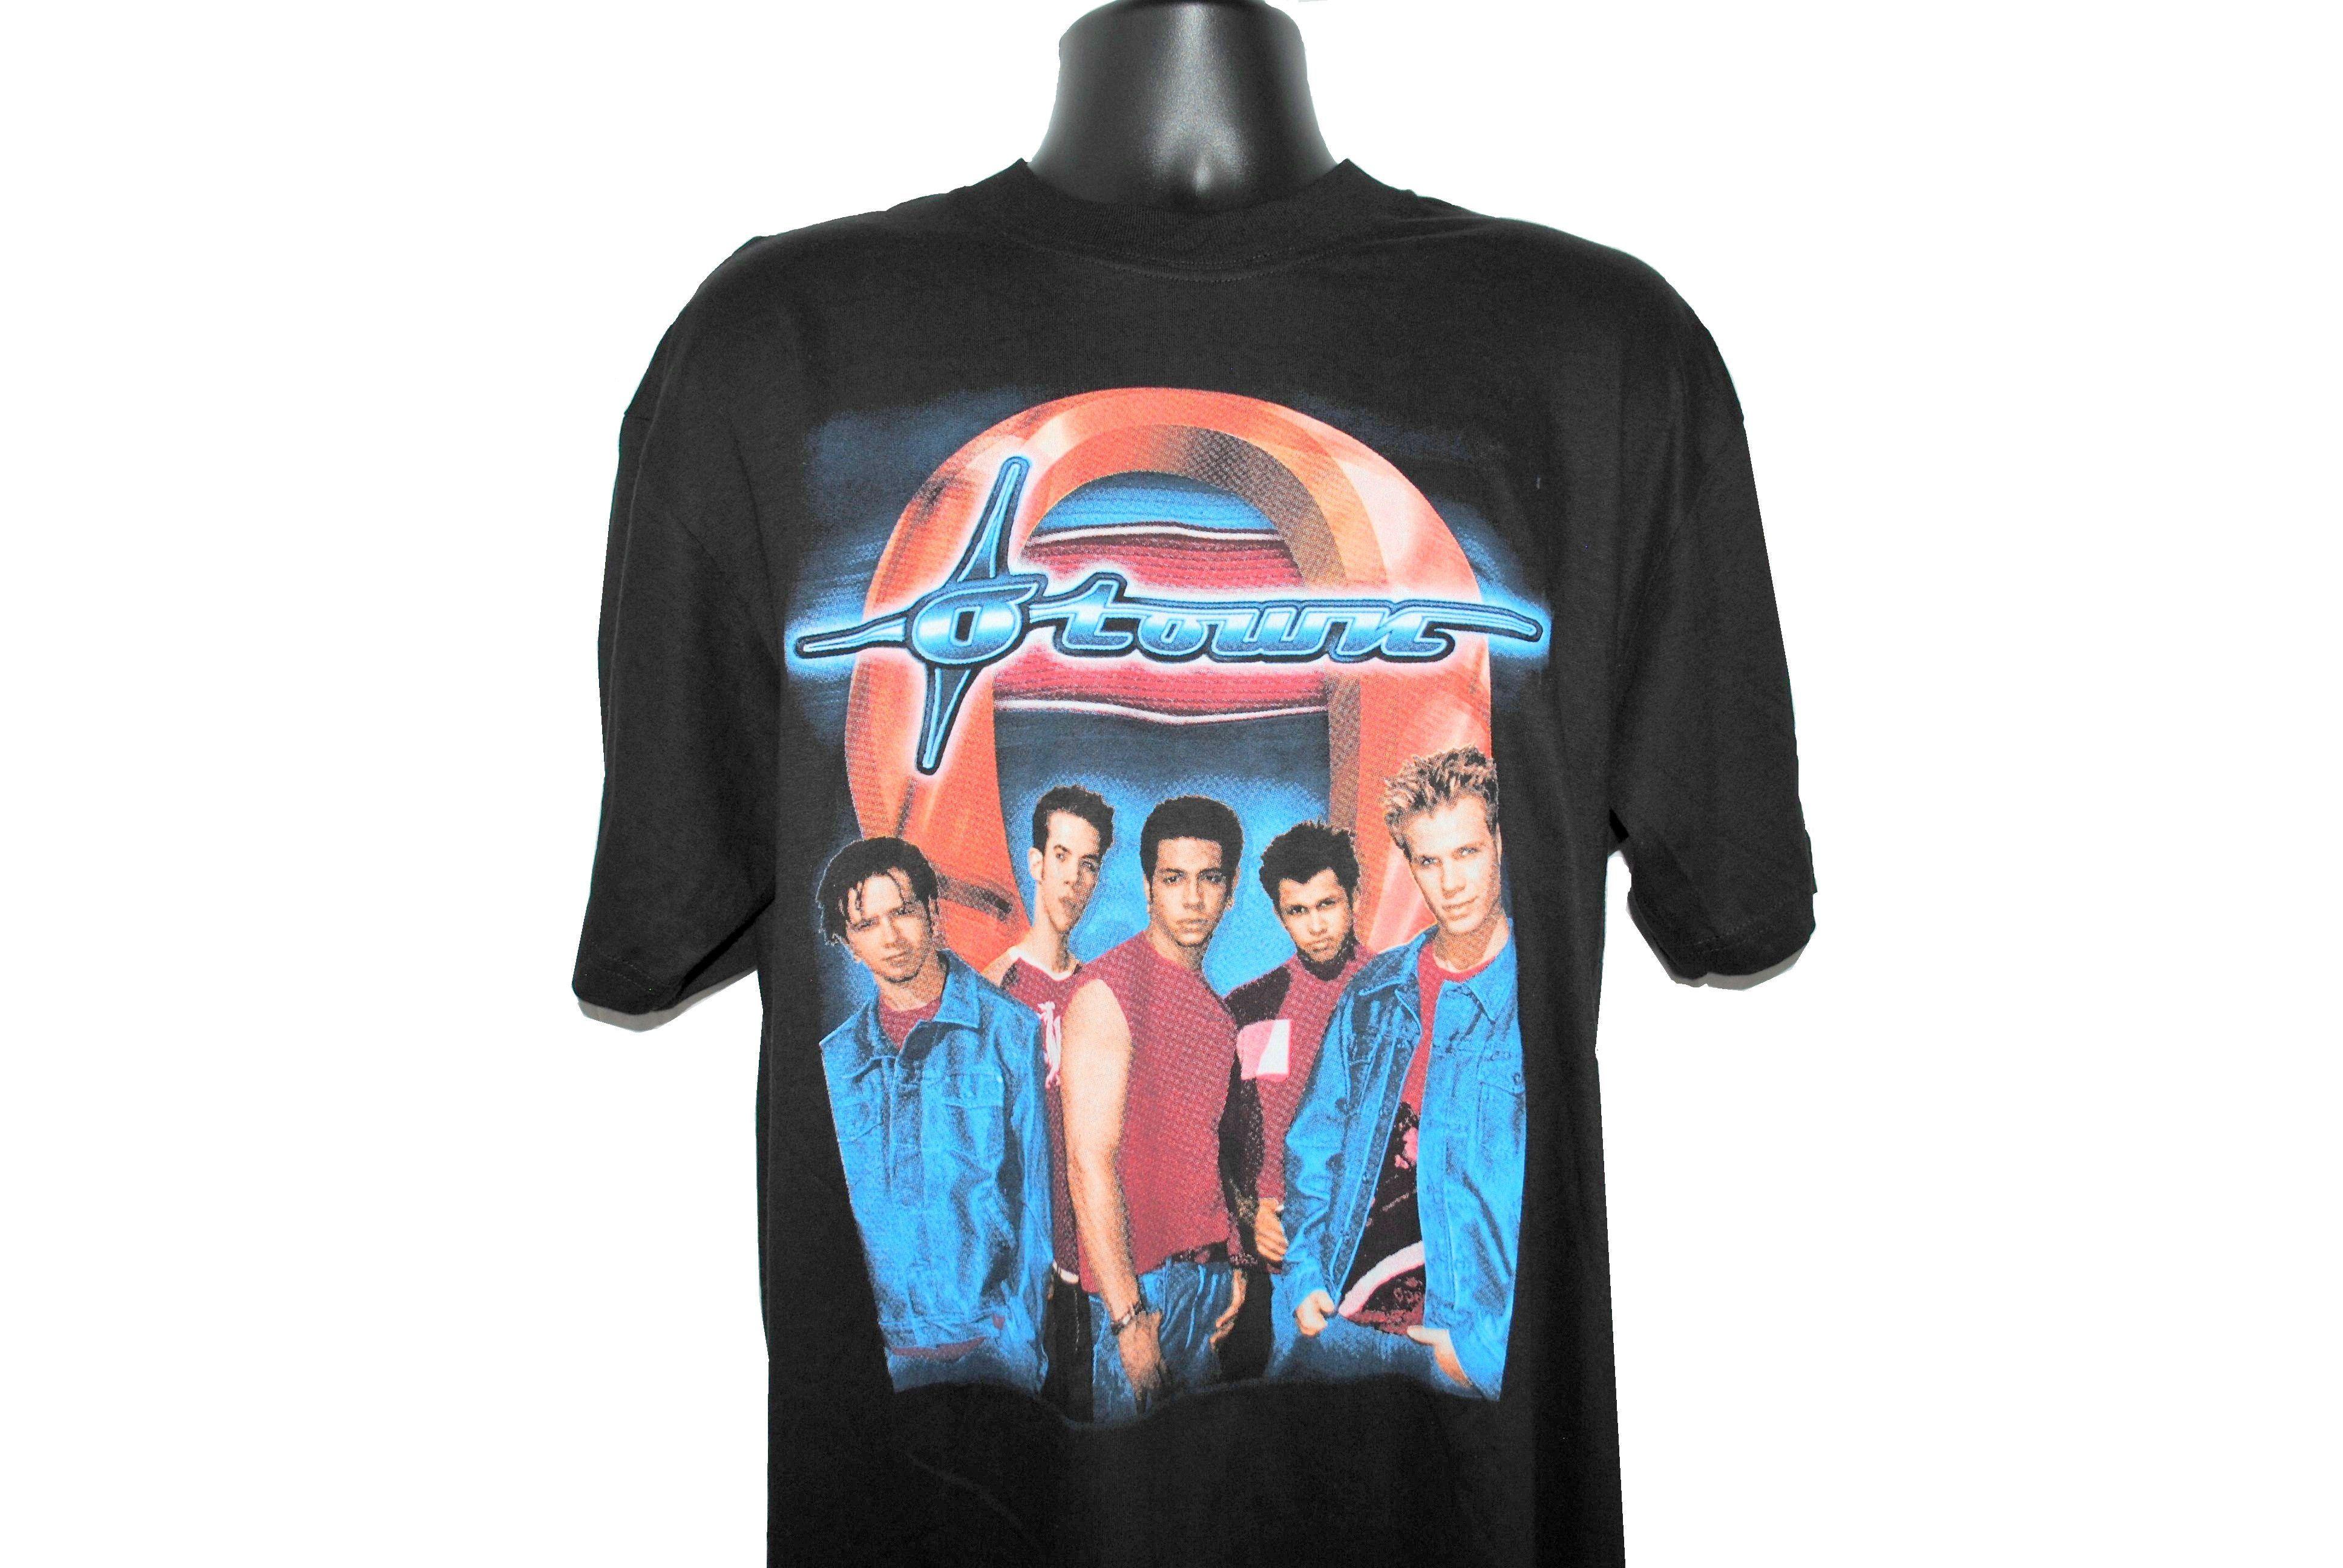 2003 O-Town Rare Vintage We Fit Together Era Hip Hop Style Parking Lot Bootleg MTV Making The Band Pop Music Concert Tour T-Shirt